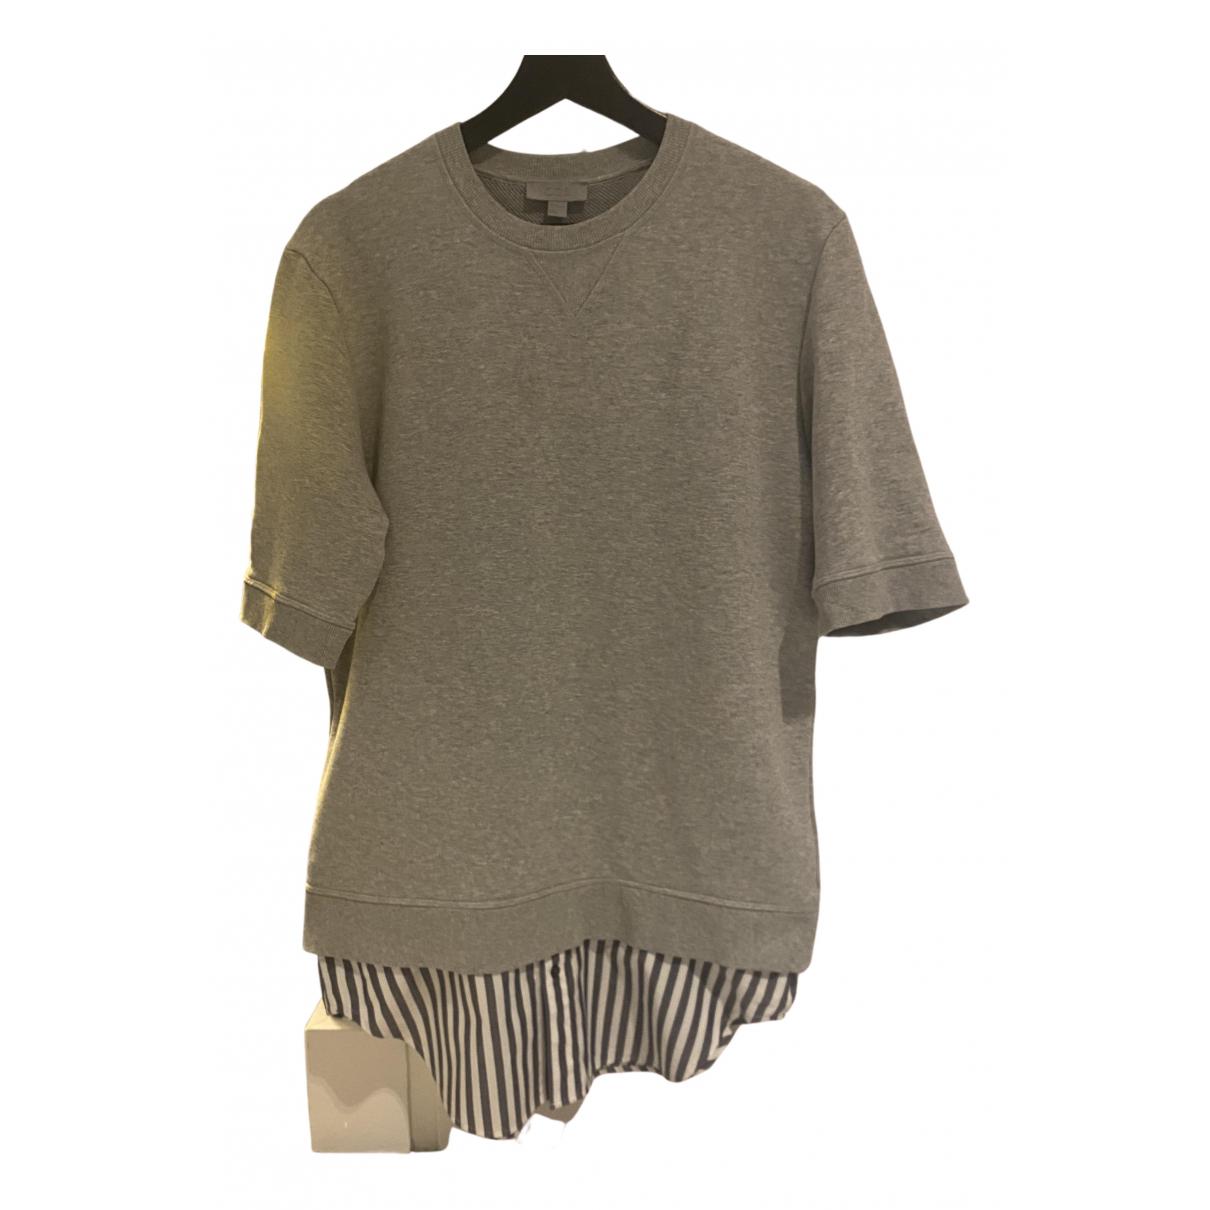 Cos N Grey Cotton Knitwear & Sweatshirts for Men M International